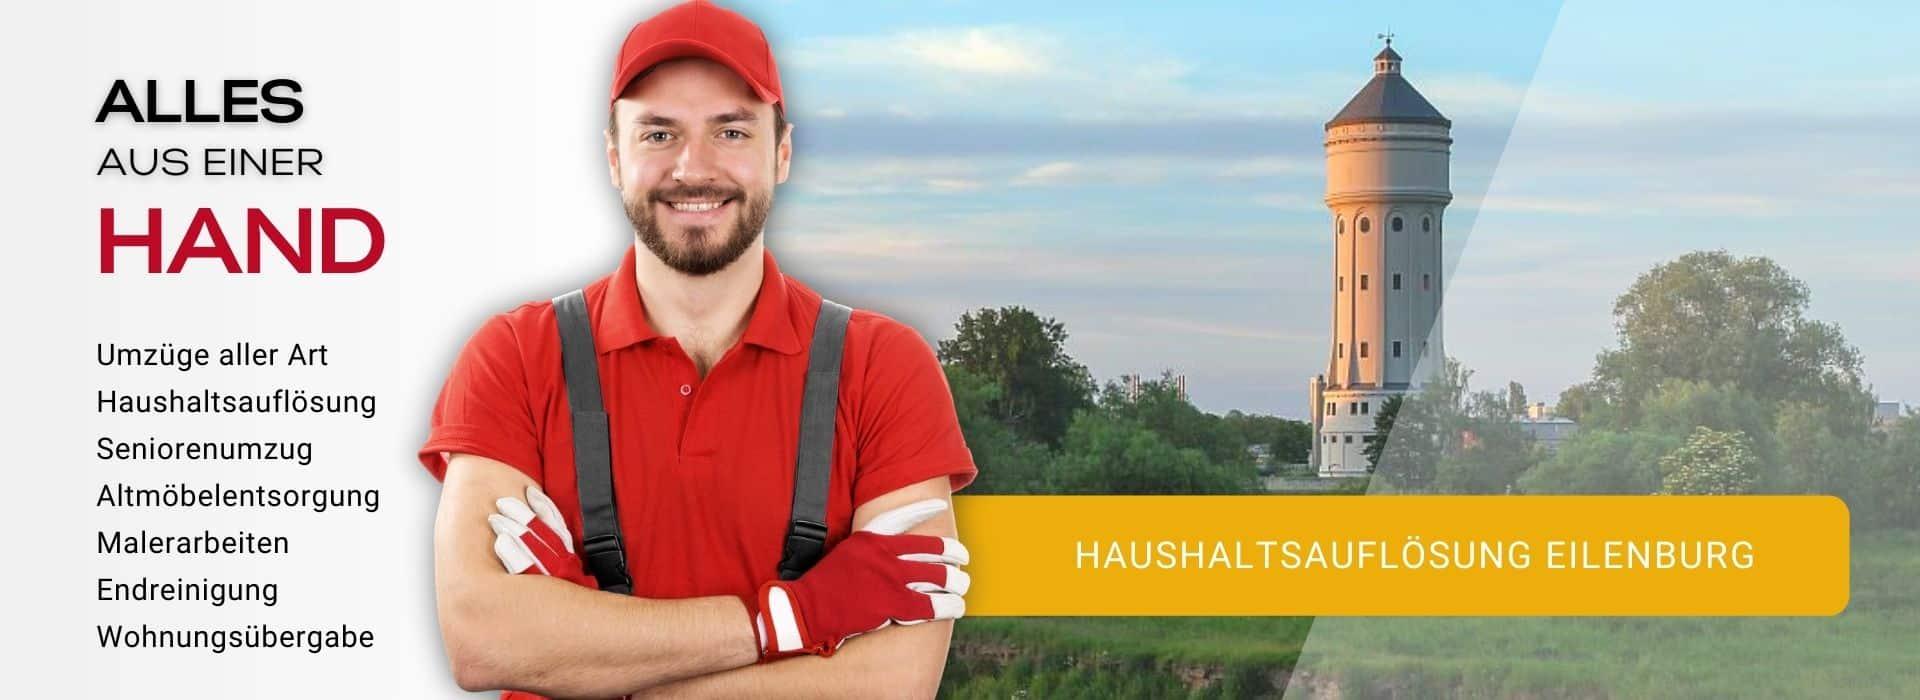 Haushaltsauflösung Eilenburg Entrümpelung